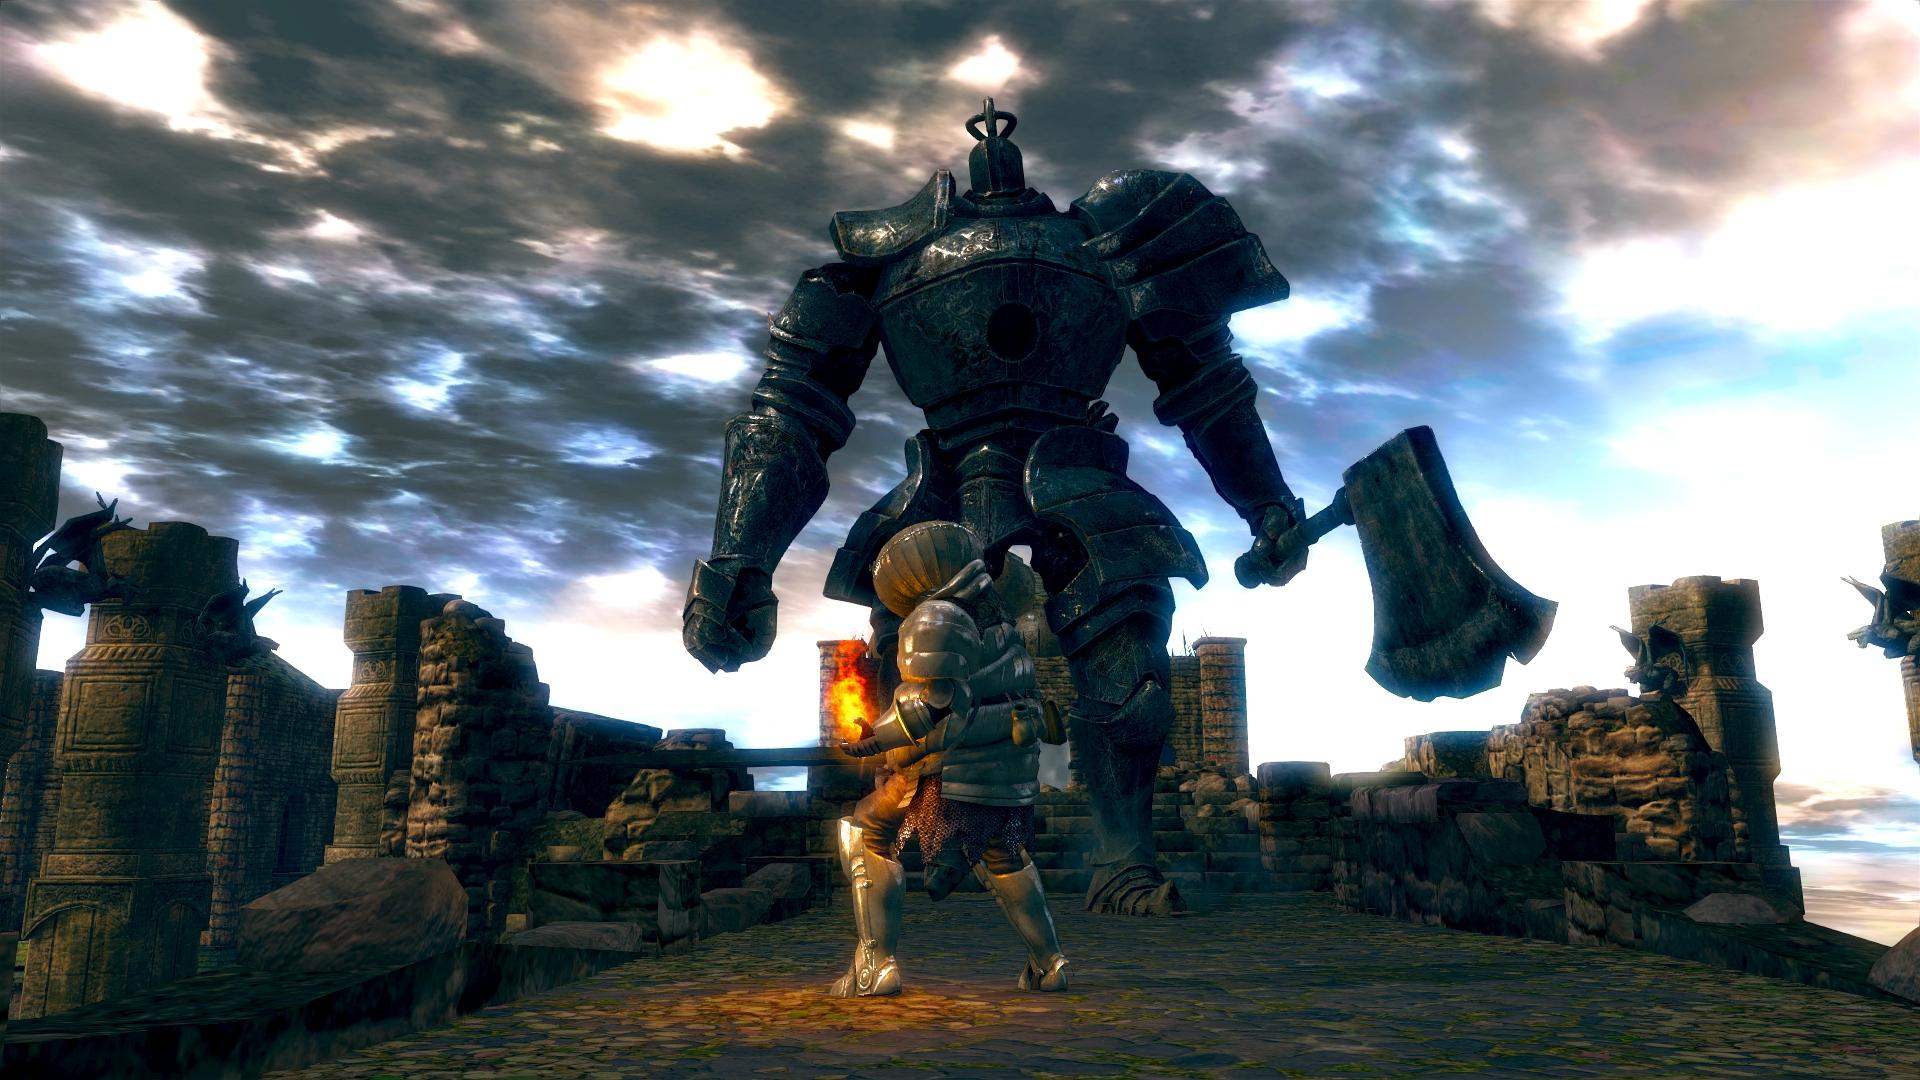 Dark Souls Iron Golem.jpg